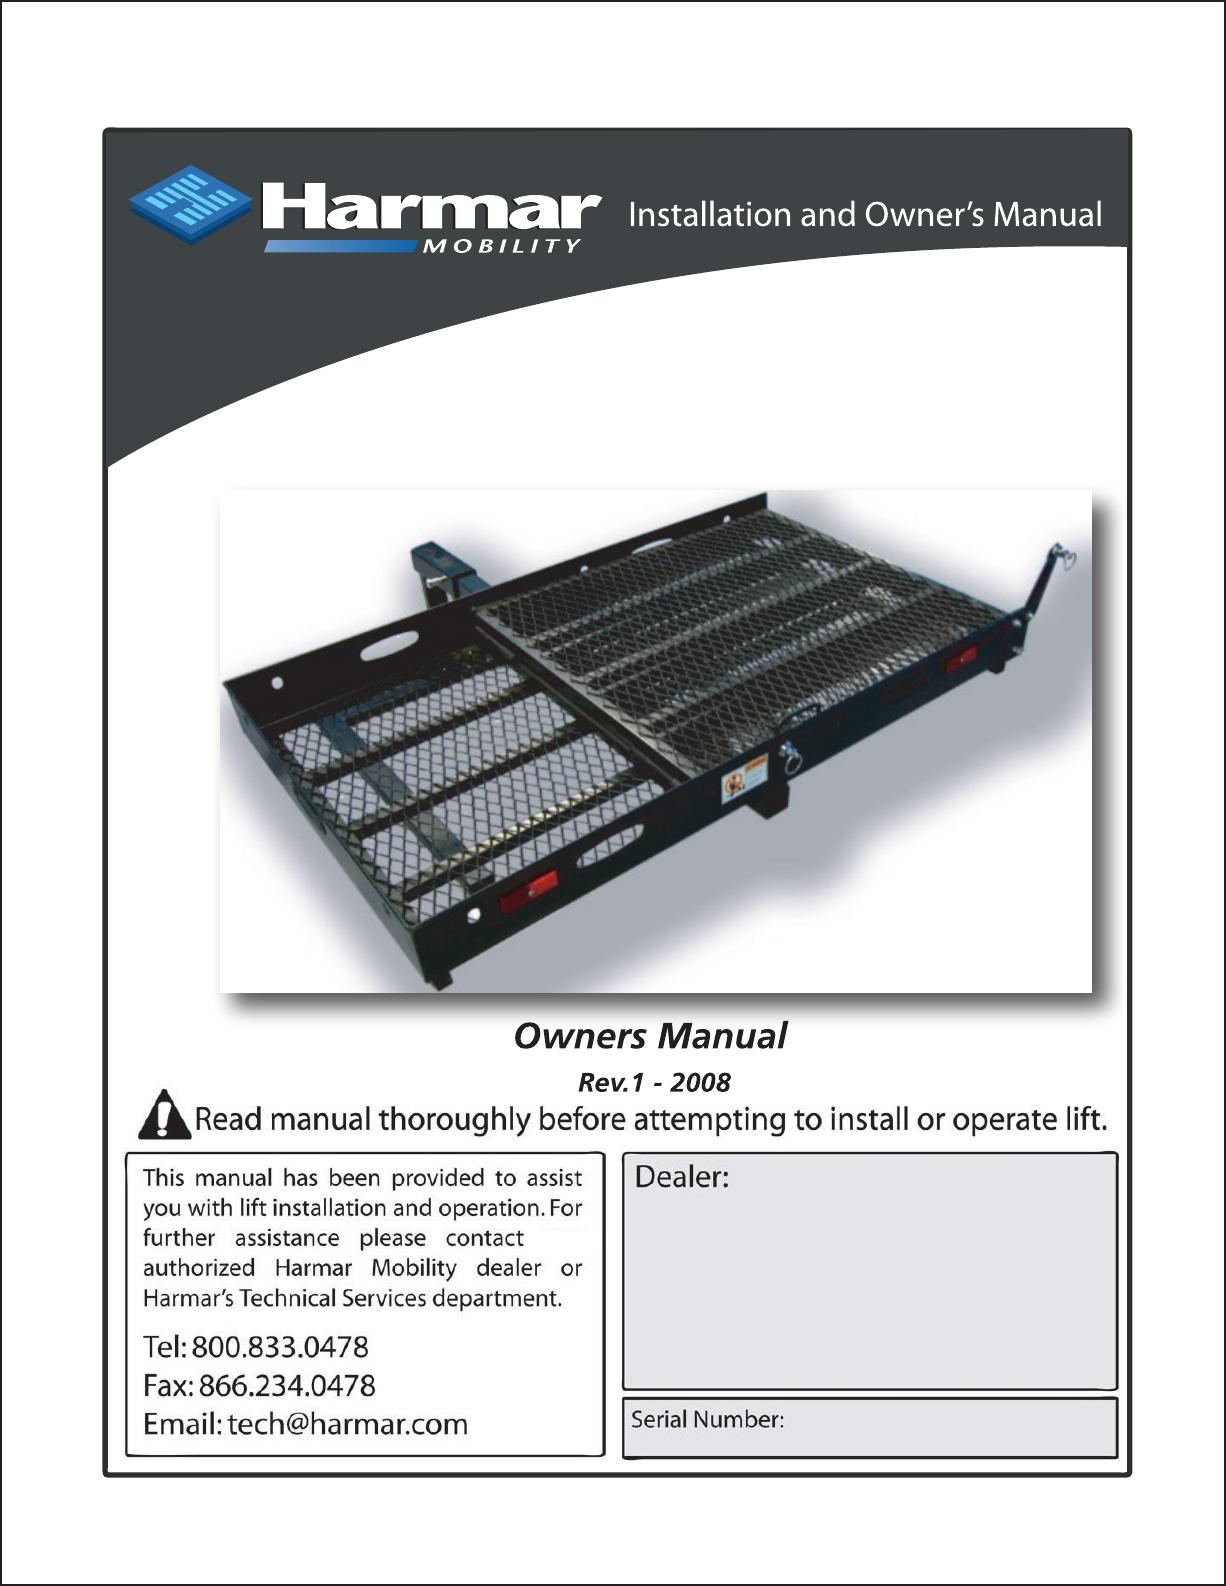 Harmar Mobility Al001 Users Manual on